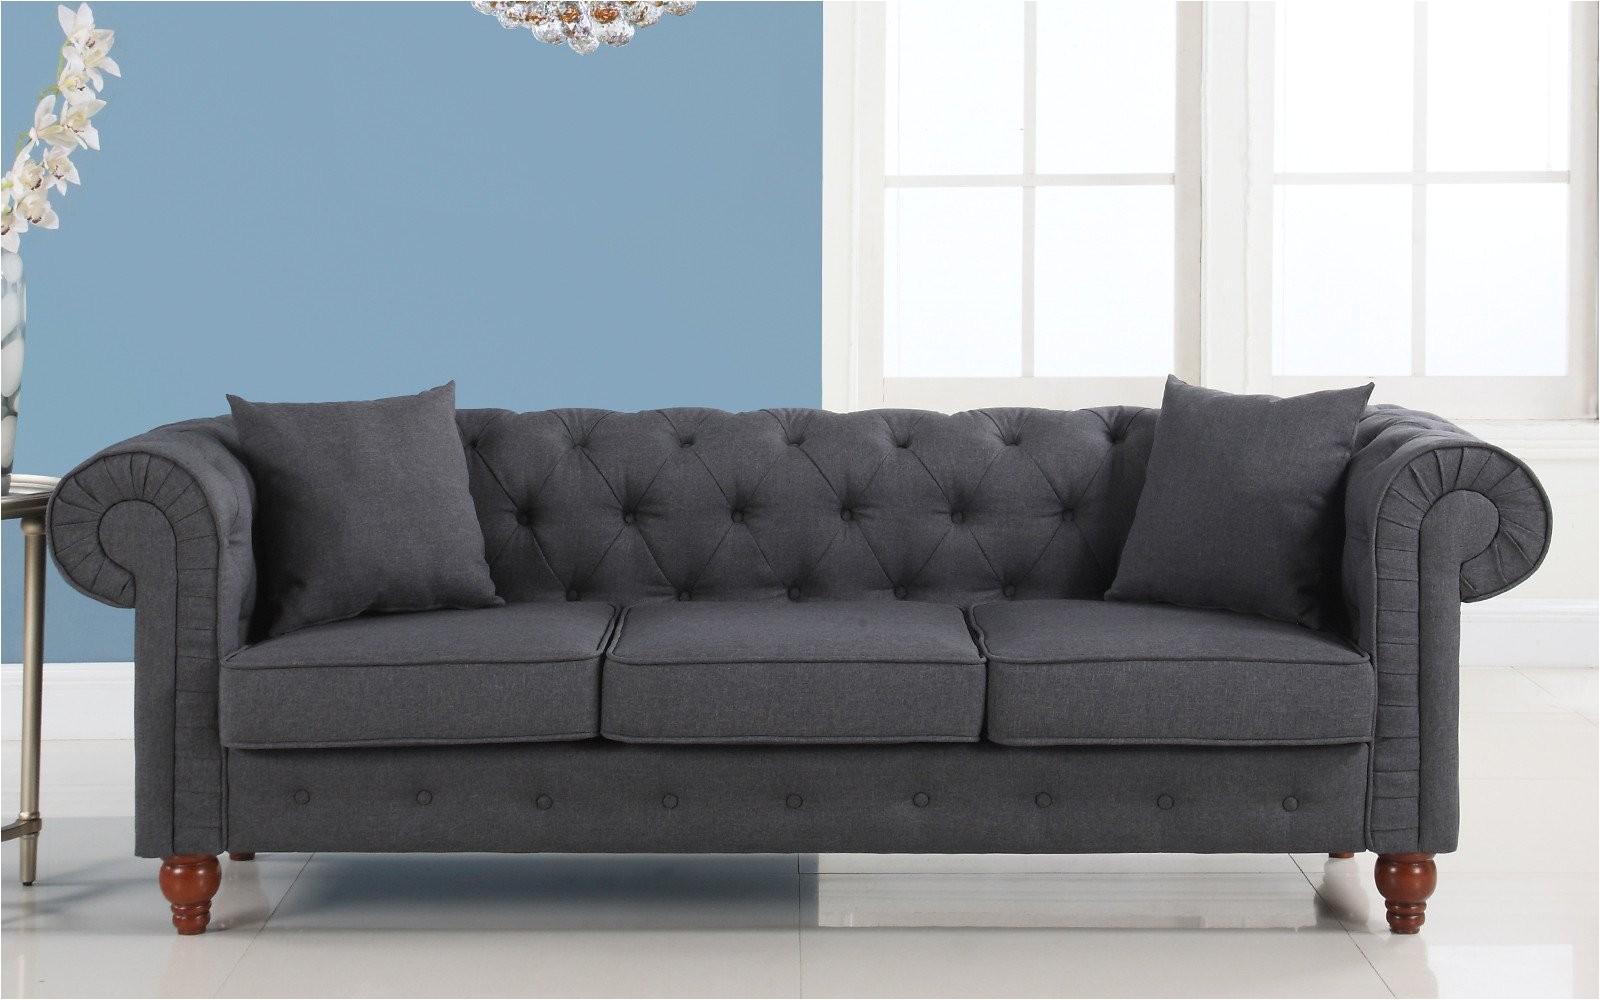 Chesterfield sofa Gray Stratford Classic Grey Fabric Chesterfield sofa In Dark Grey 399